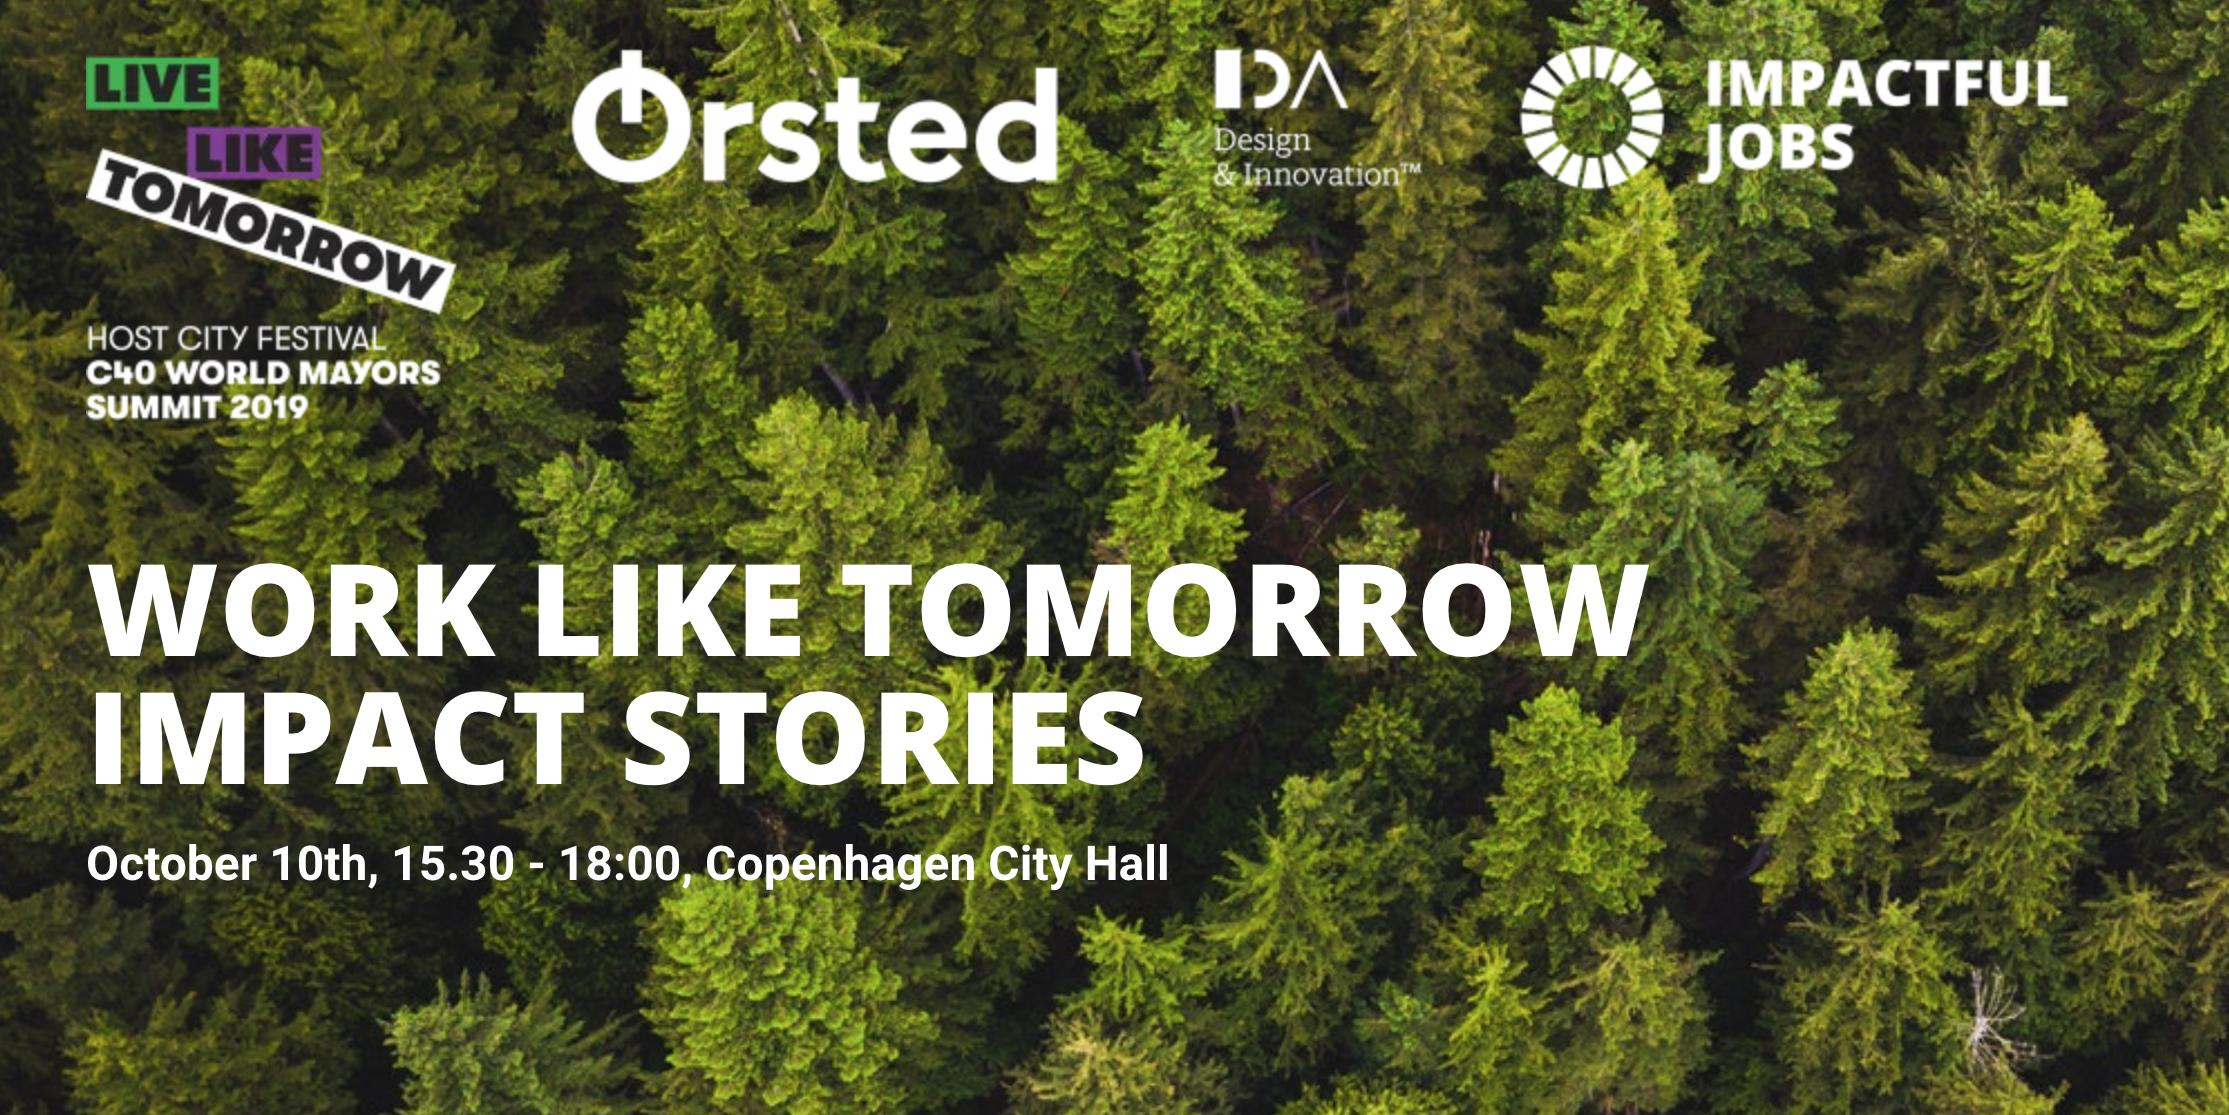 Work Like Tomorrow - Impact Stories